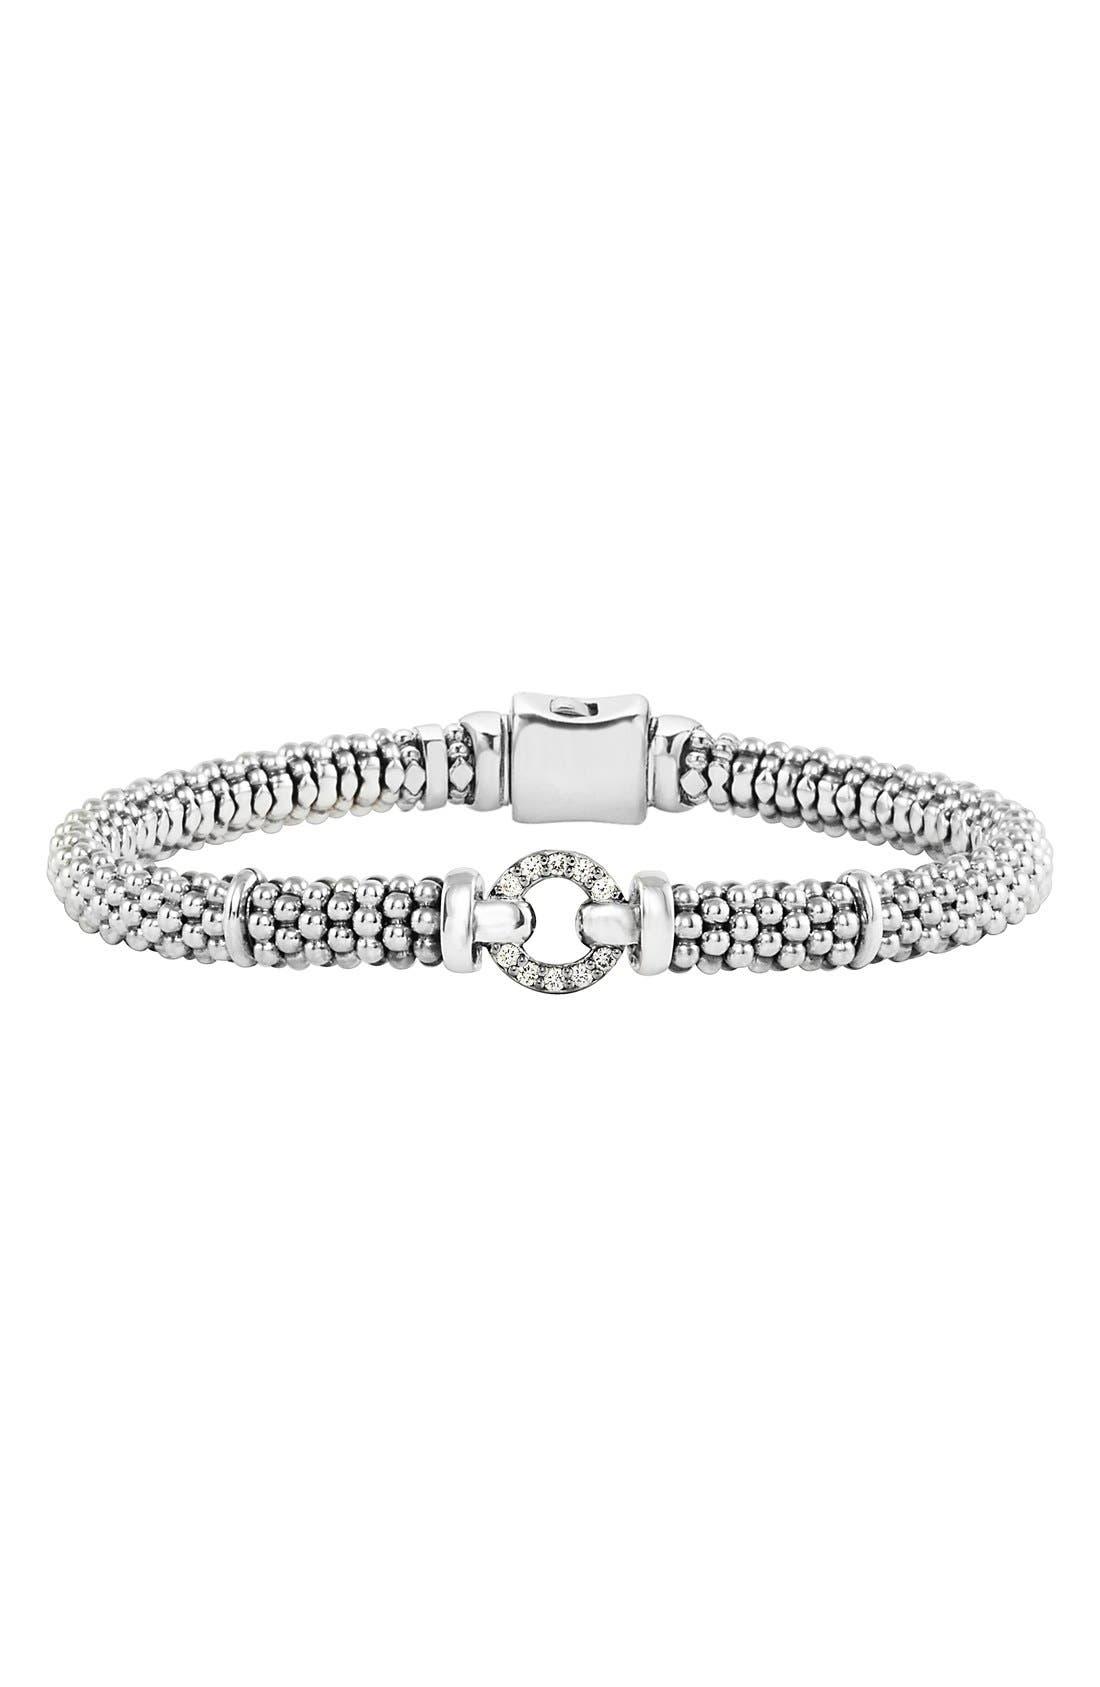 Main Image - LAGOS ENSO Diamond Bracelet